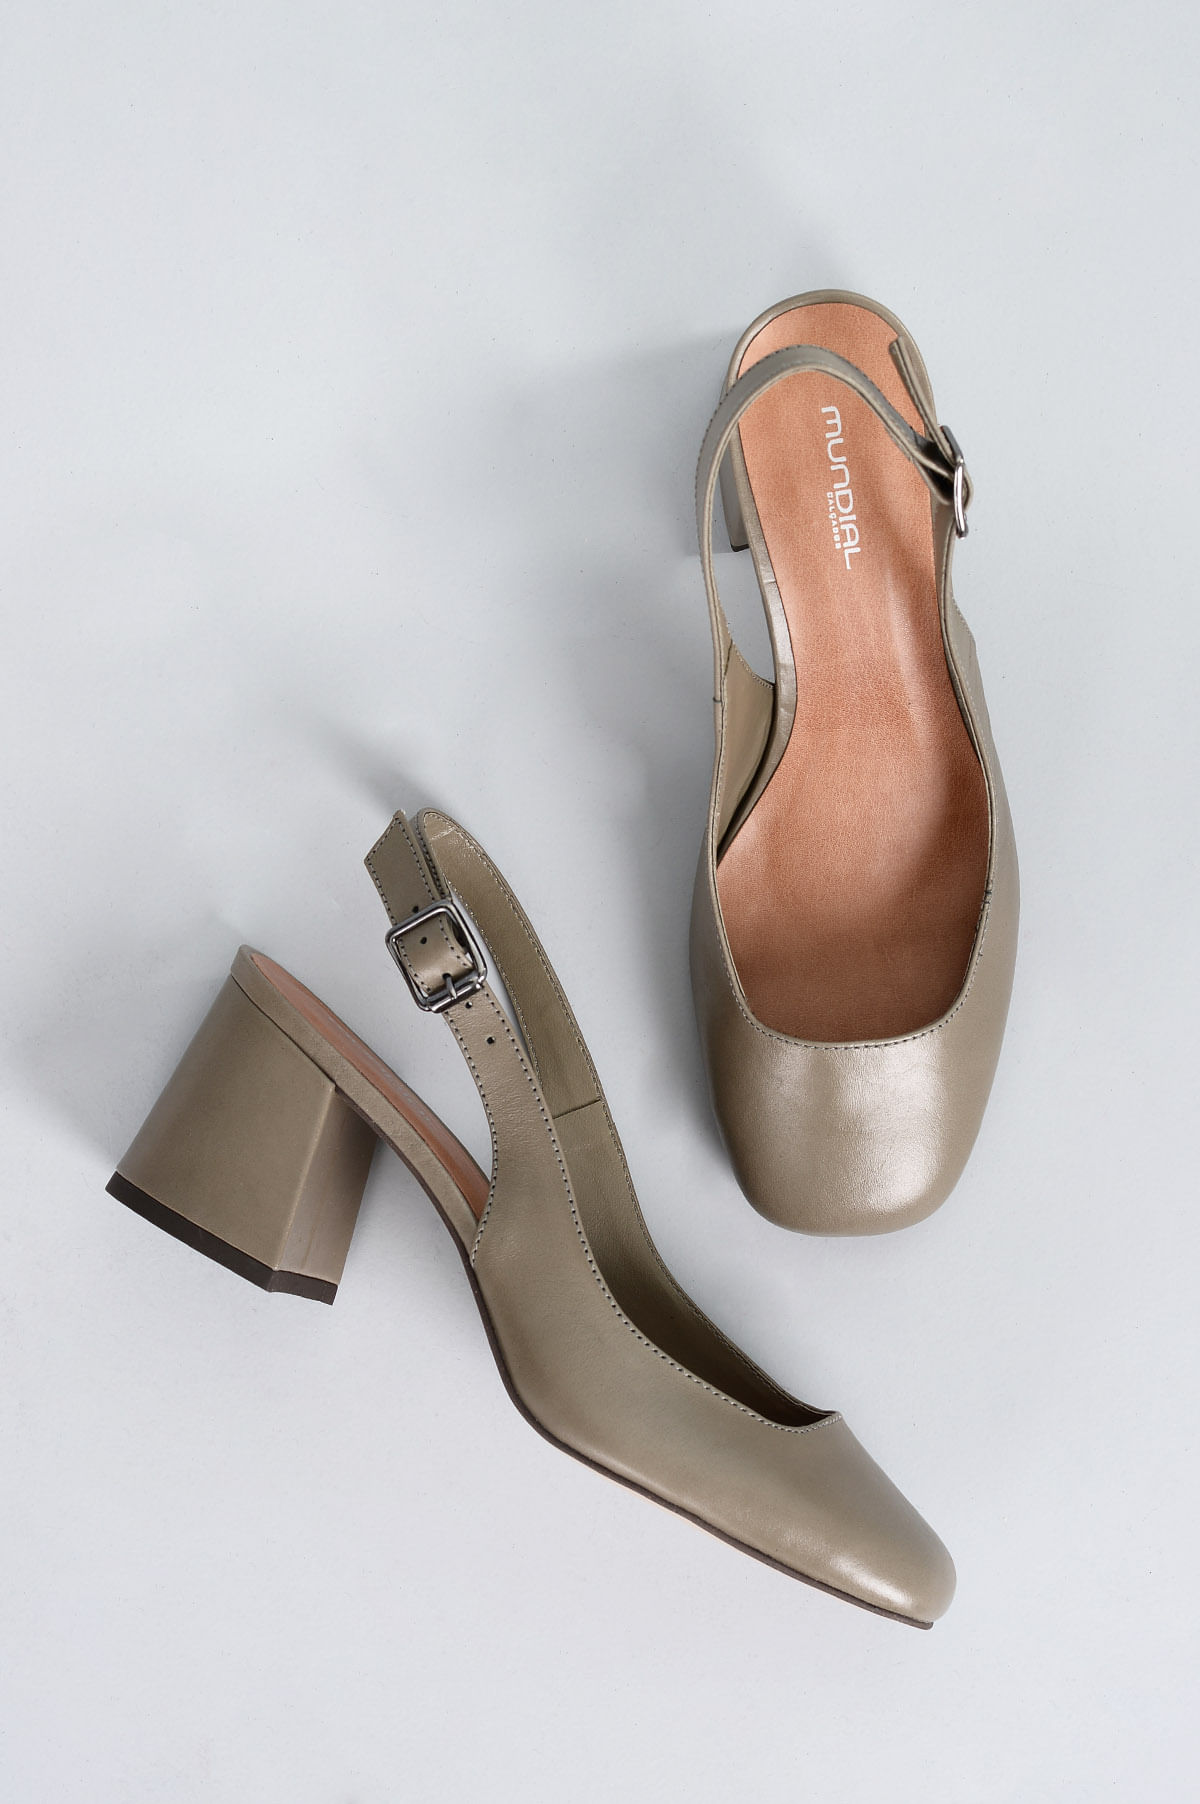 f7ddb84b0 Sapato Feminino Salto Alto Enyd Mundial CR-CINZA - Mundial Calçados